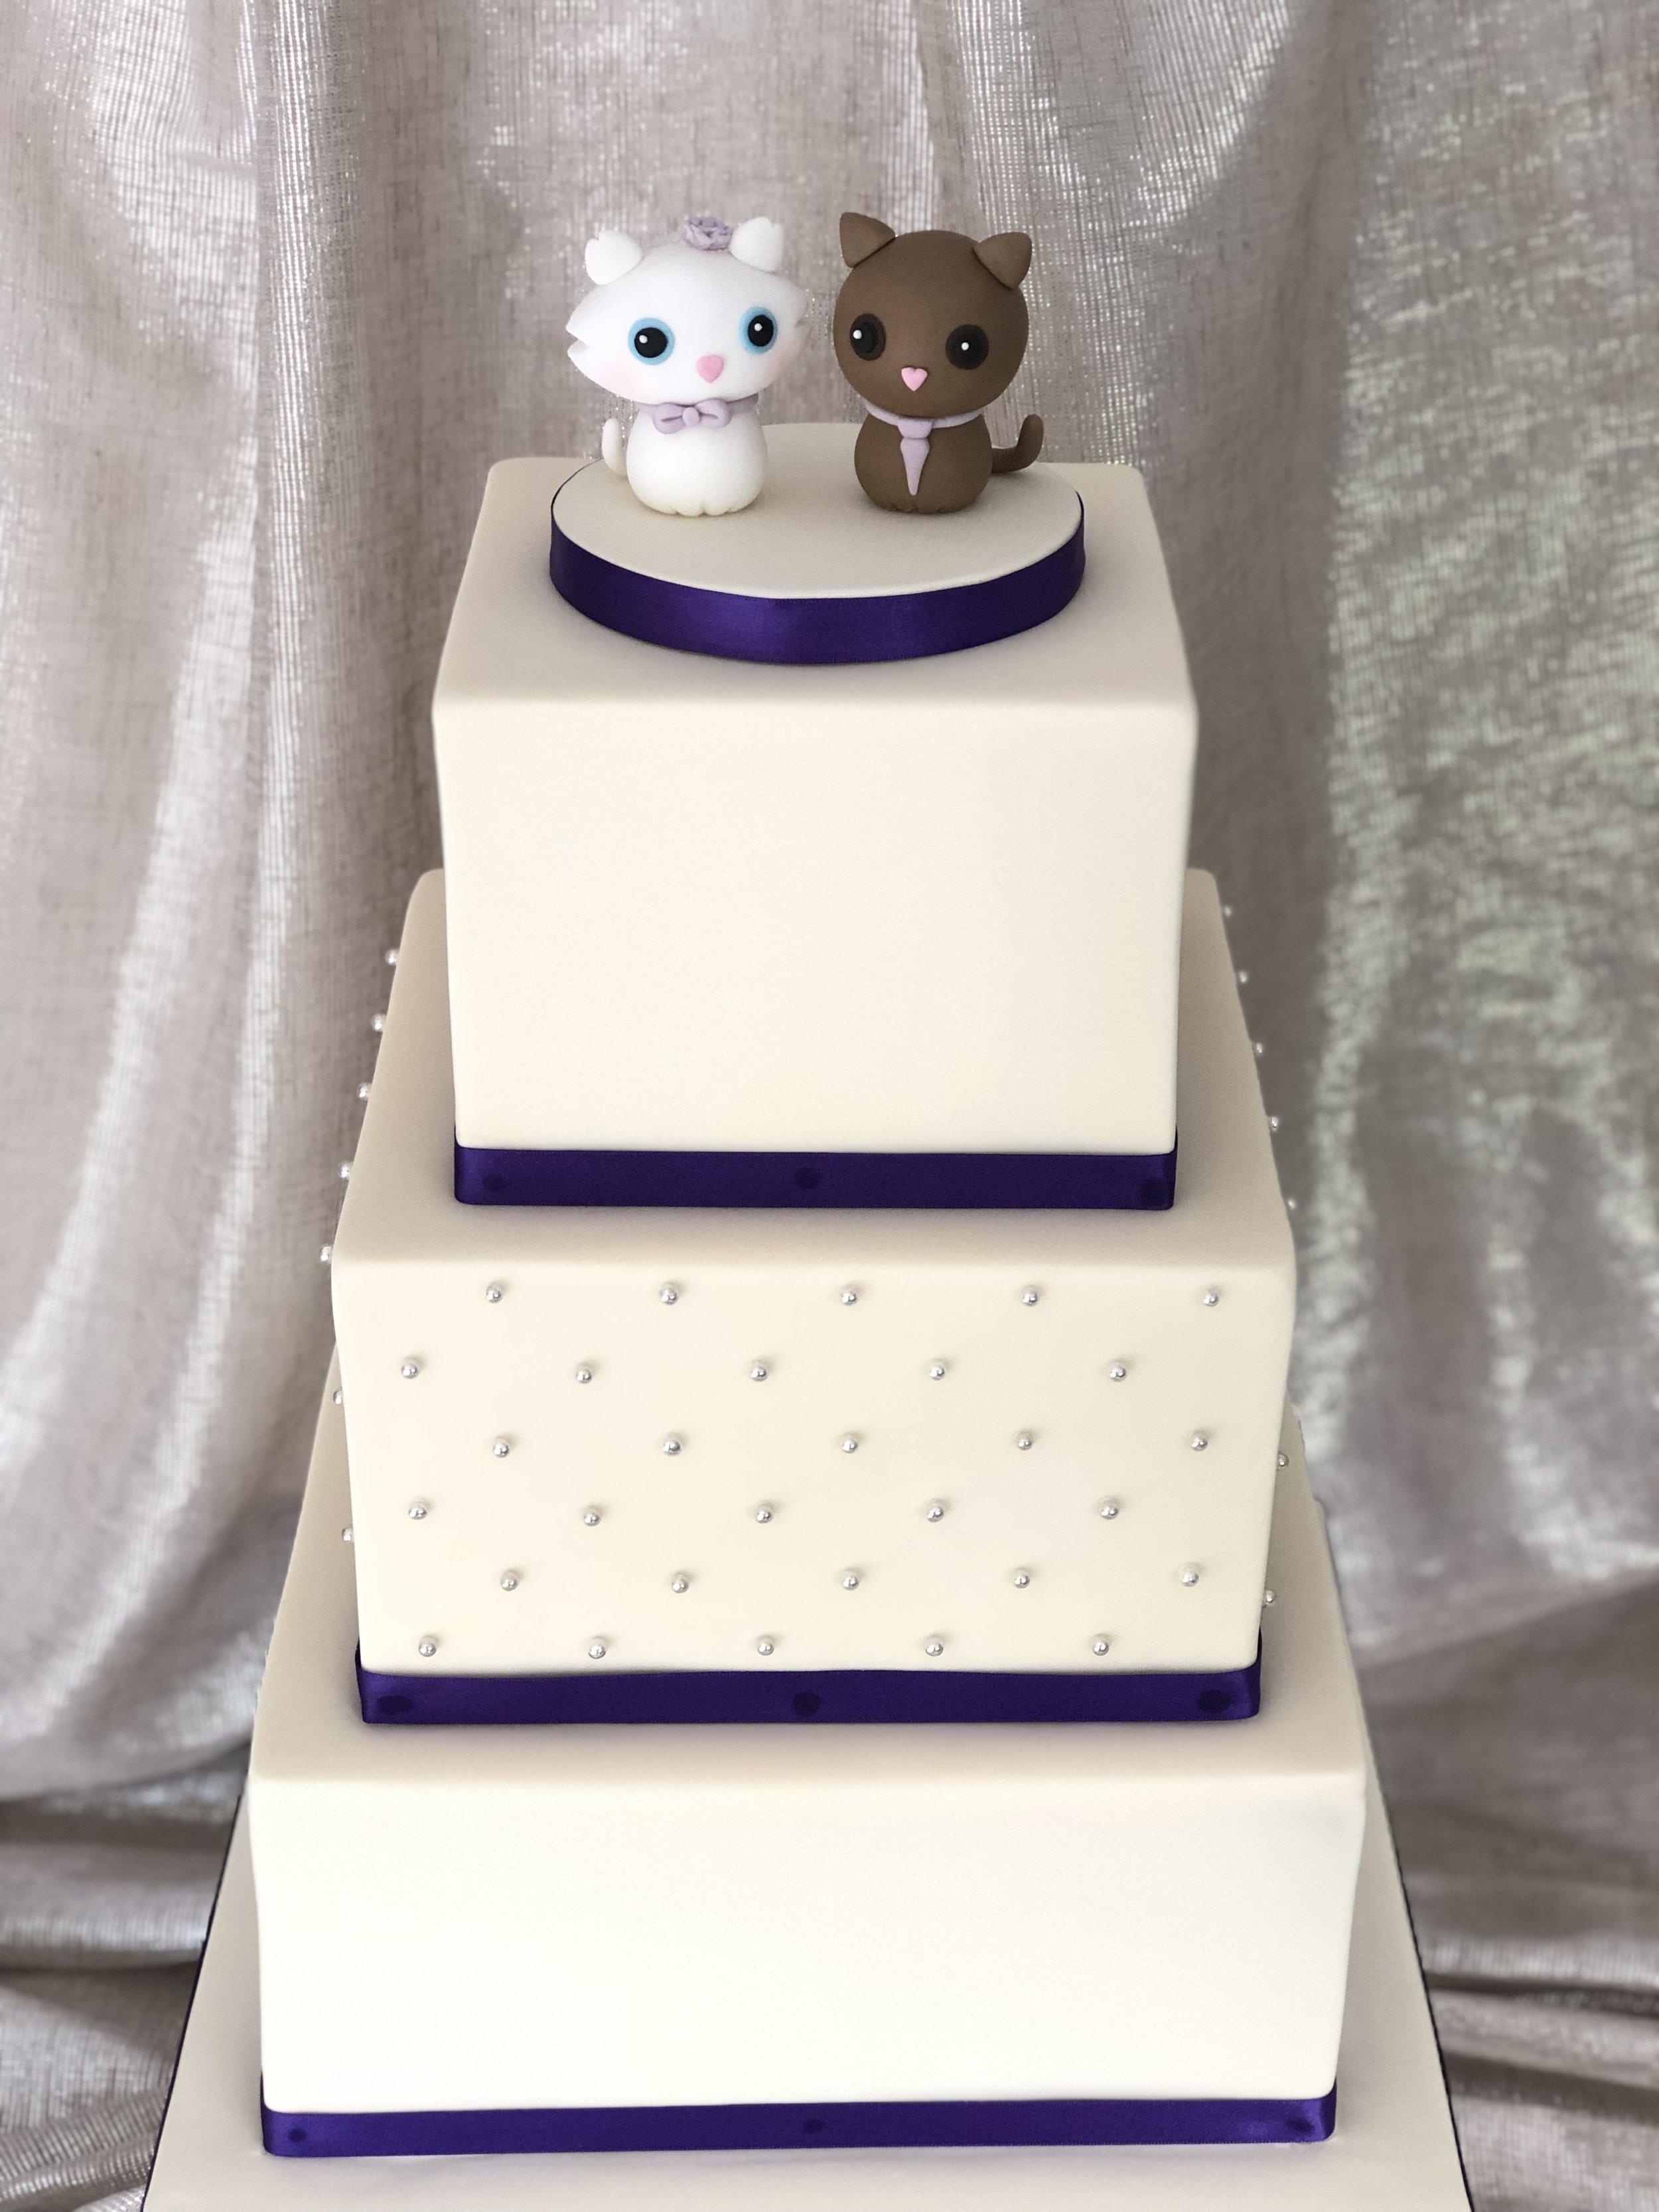 Leanne square wedding cake.jpg